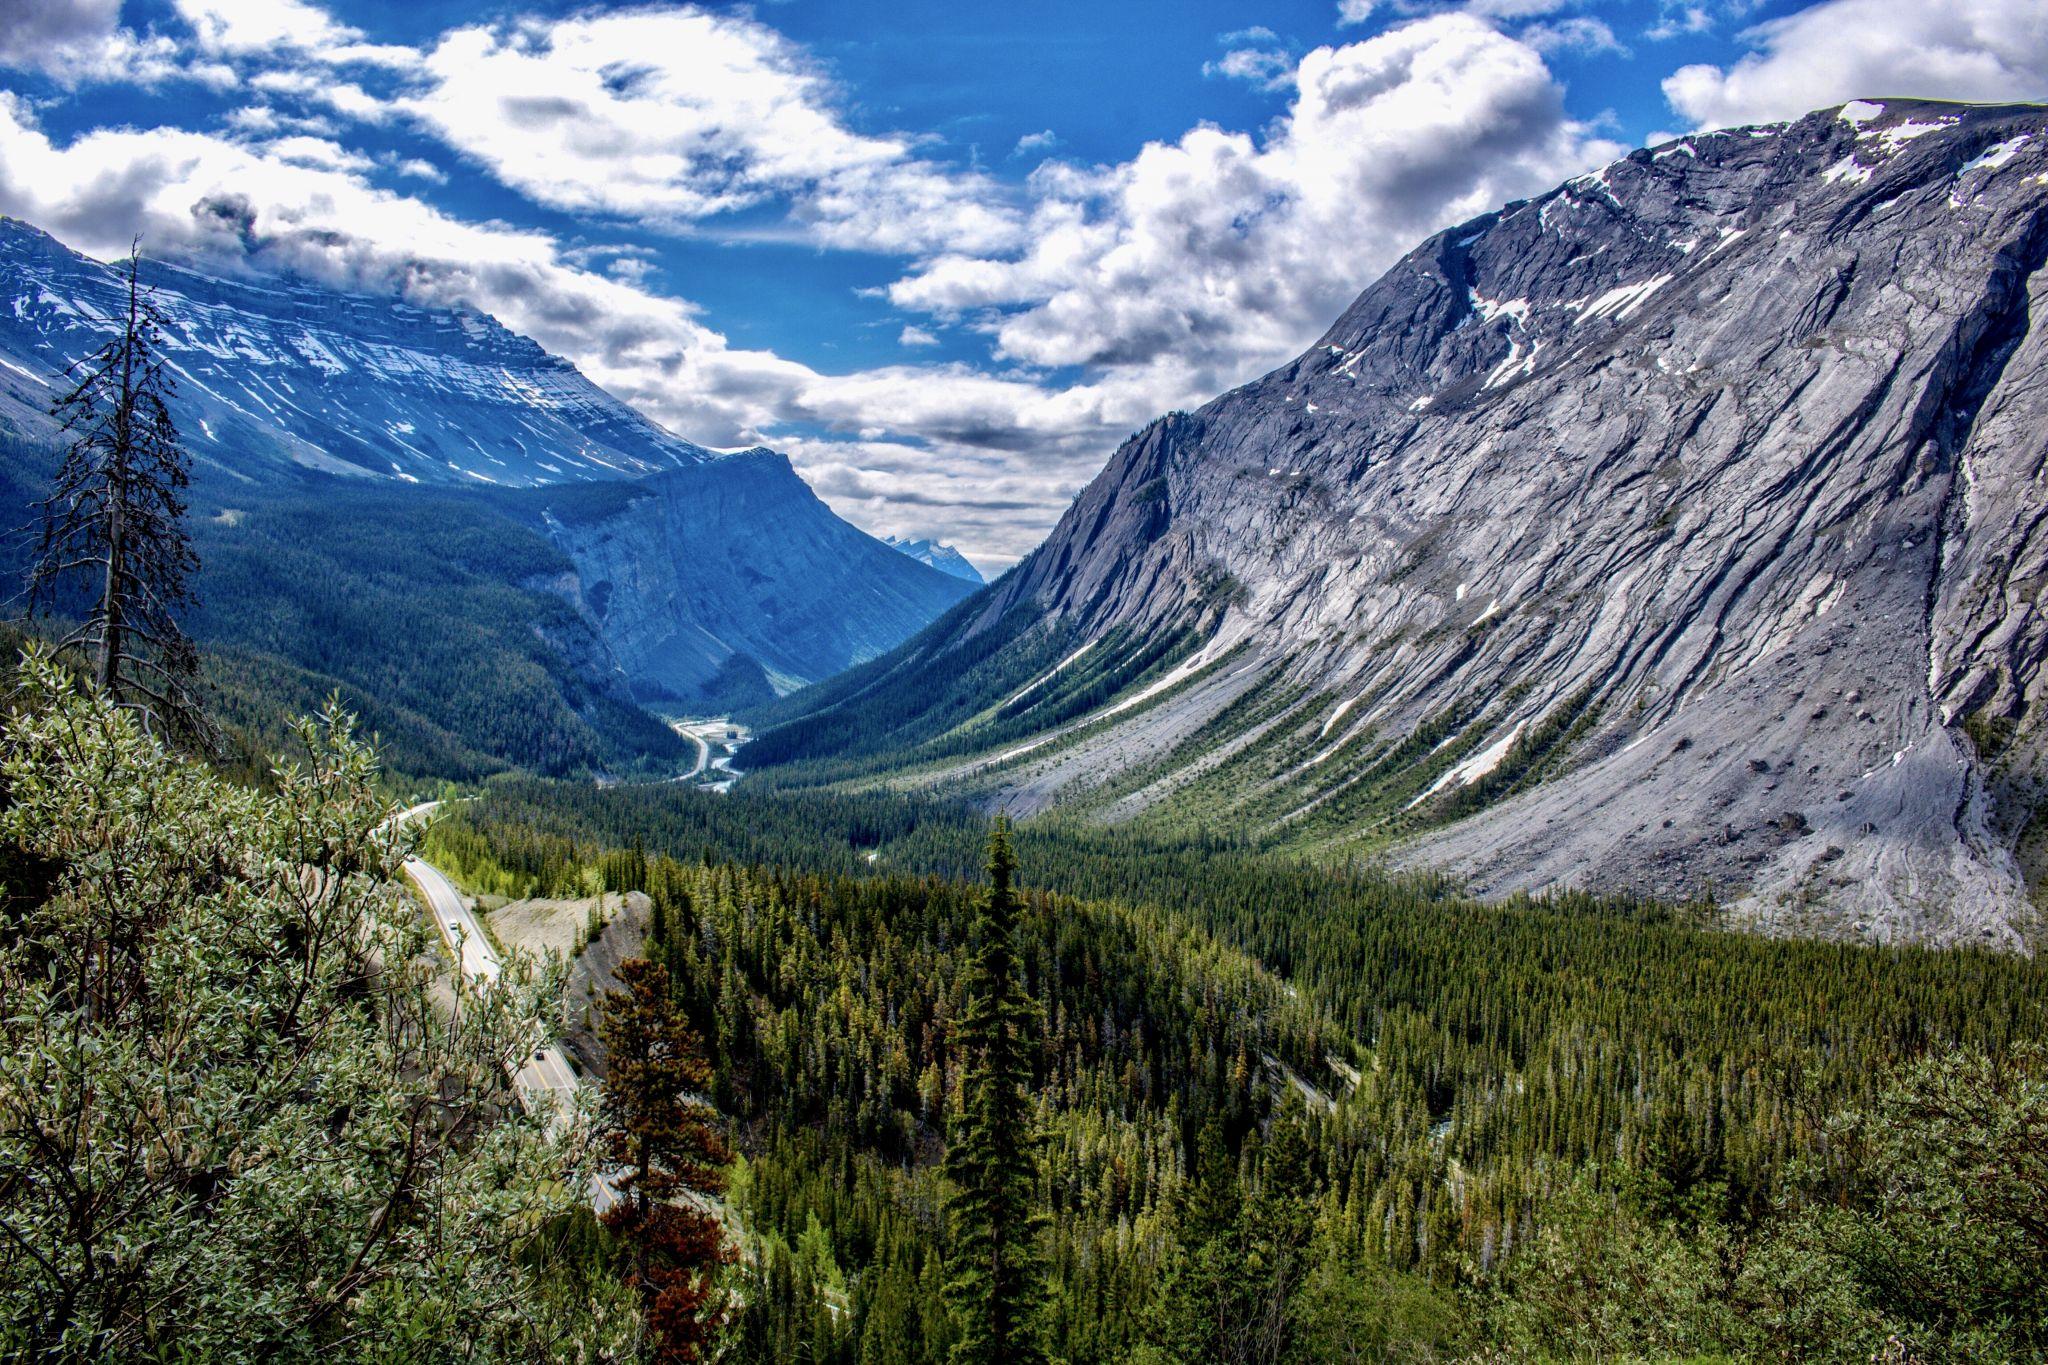 CIRRUS MOUNTAIN VIEWPOINT, Canada